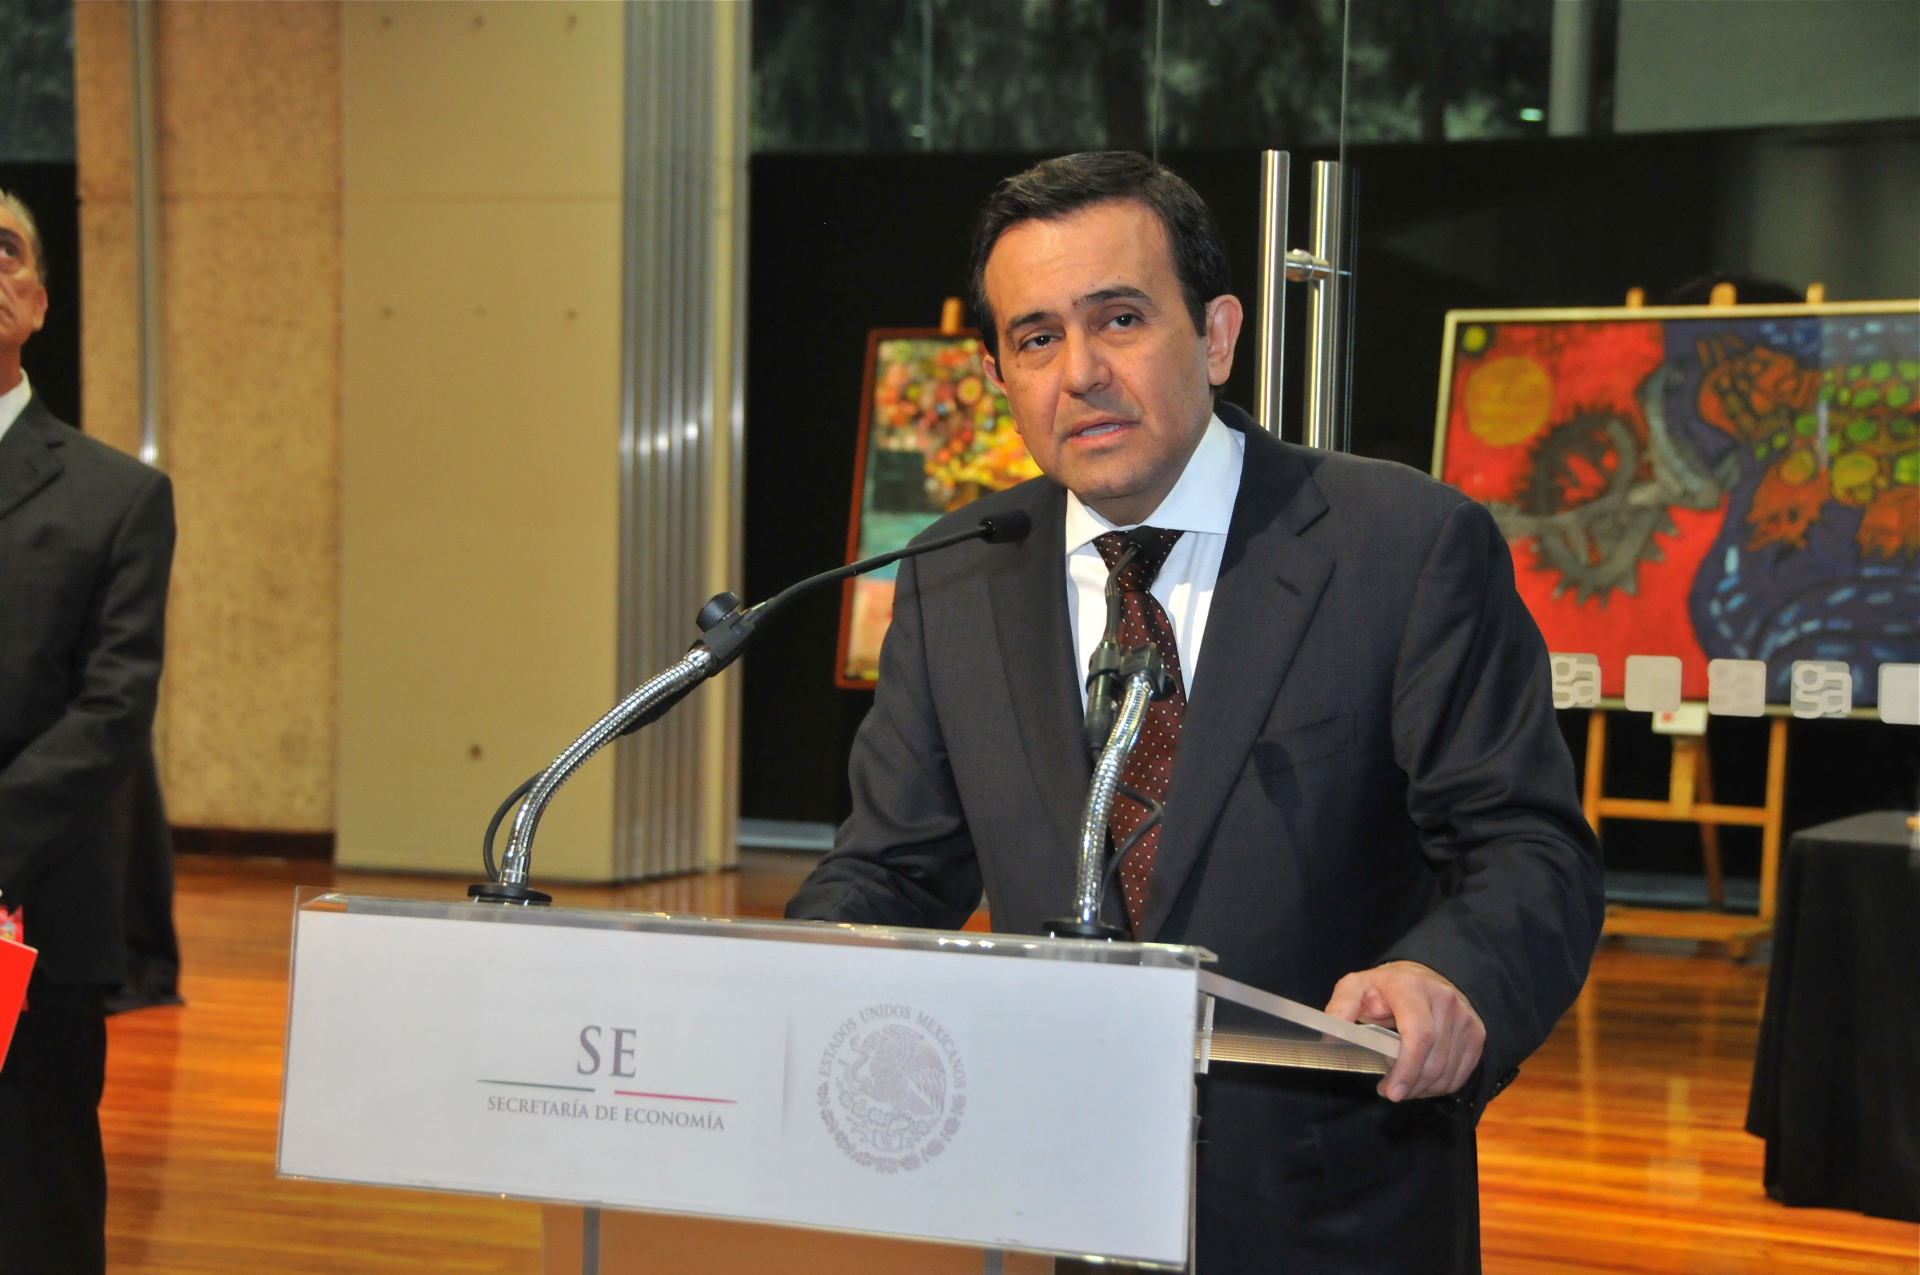 Ildefonso Guajardo Villarrreal, Secretario de Economía